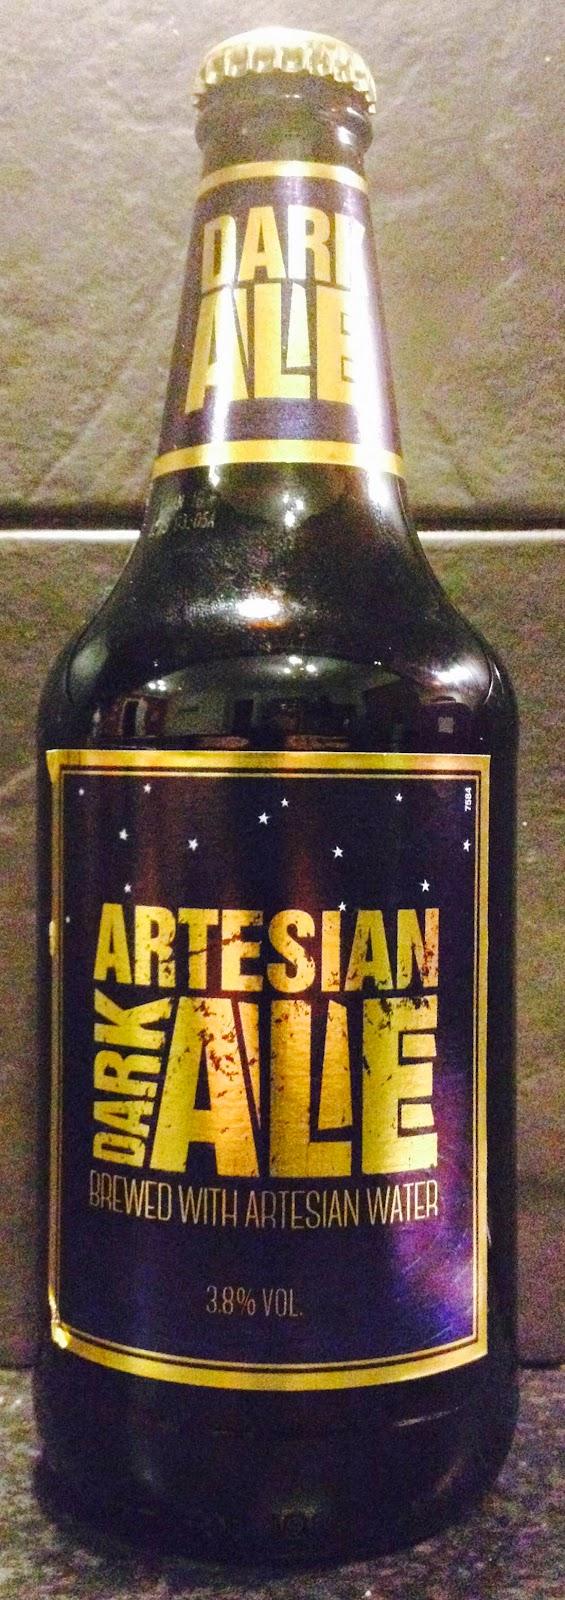 Artesian Dark Ale (Shepherd Neame)